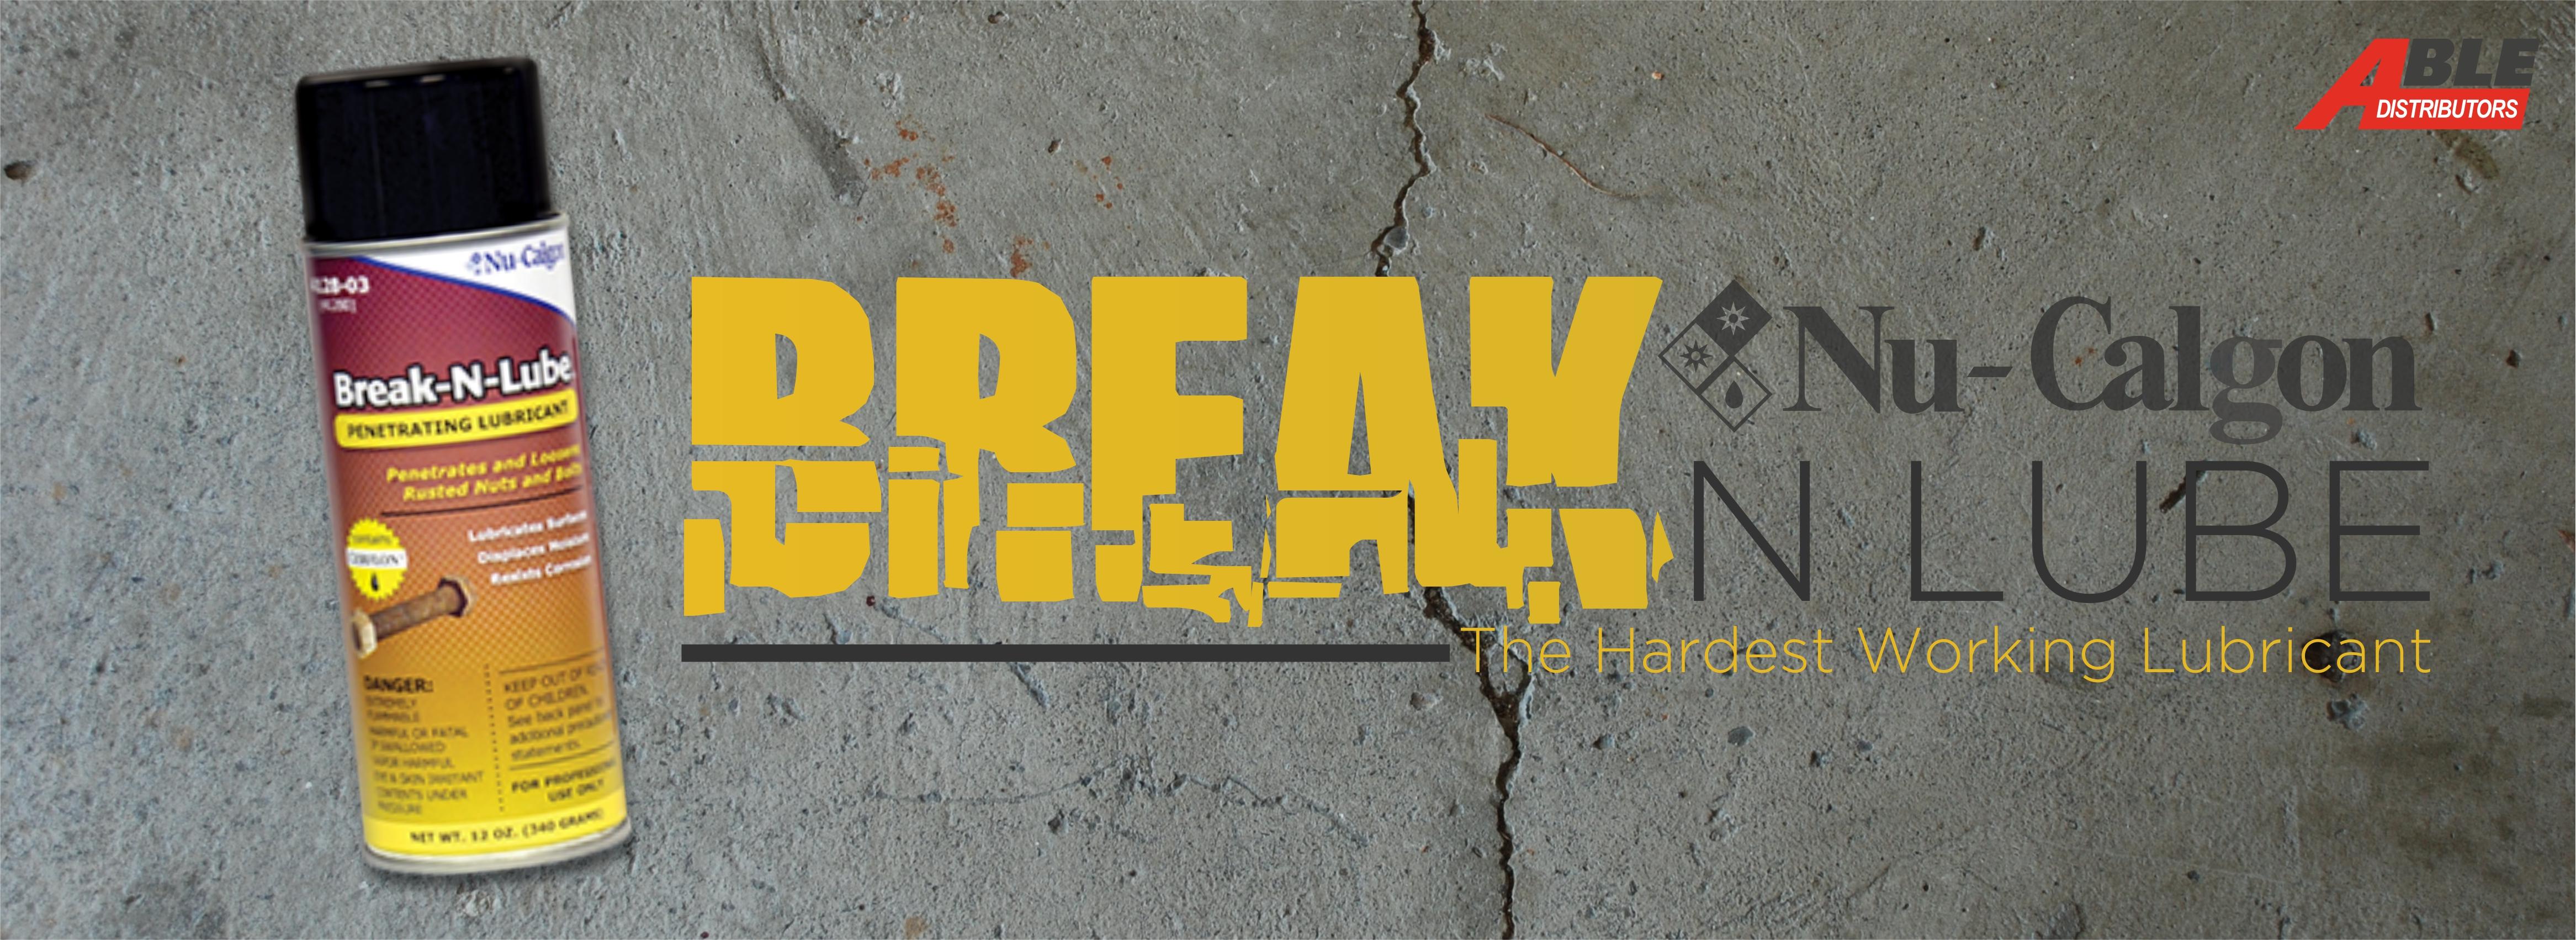 nu-calgon_break